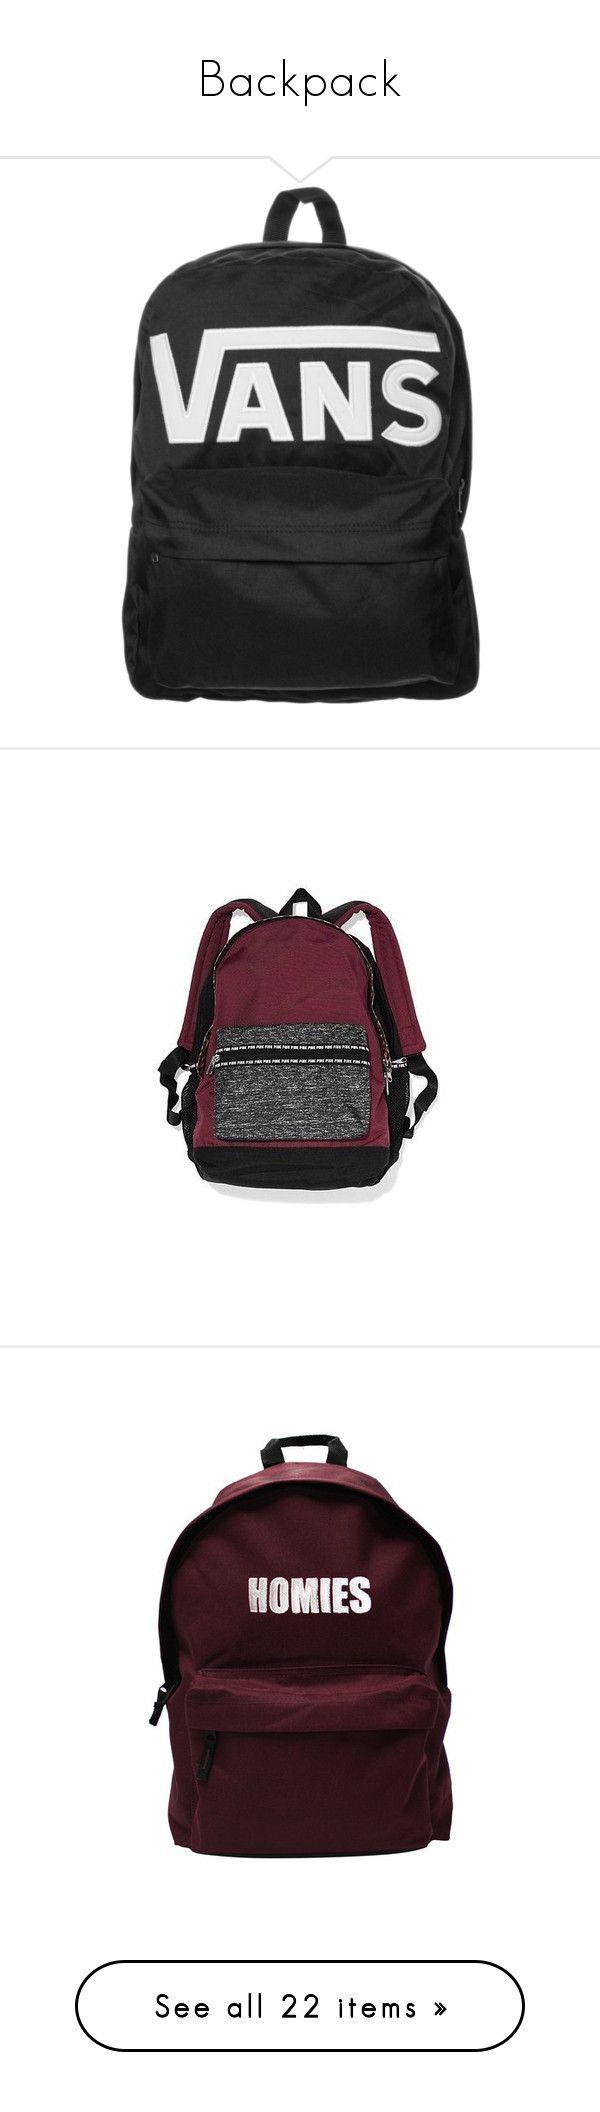 """Backpack"" by saraxx113 on Polyvore featuring bags, backpacks, accessories, vans, black, day pack rucksack, patterned backpacks, white rucksack, vans rucksack and rucksack bag"